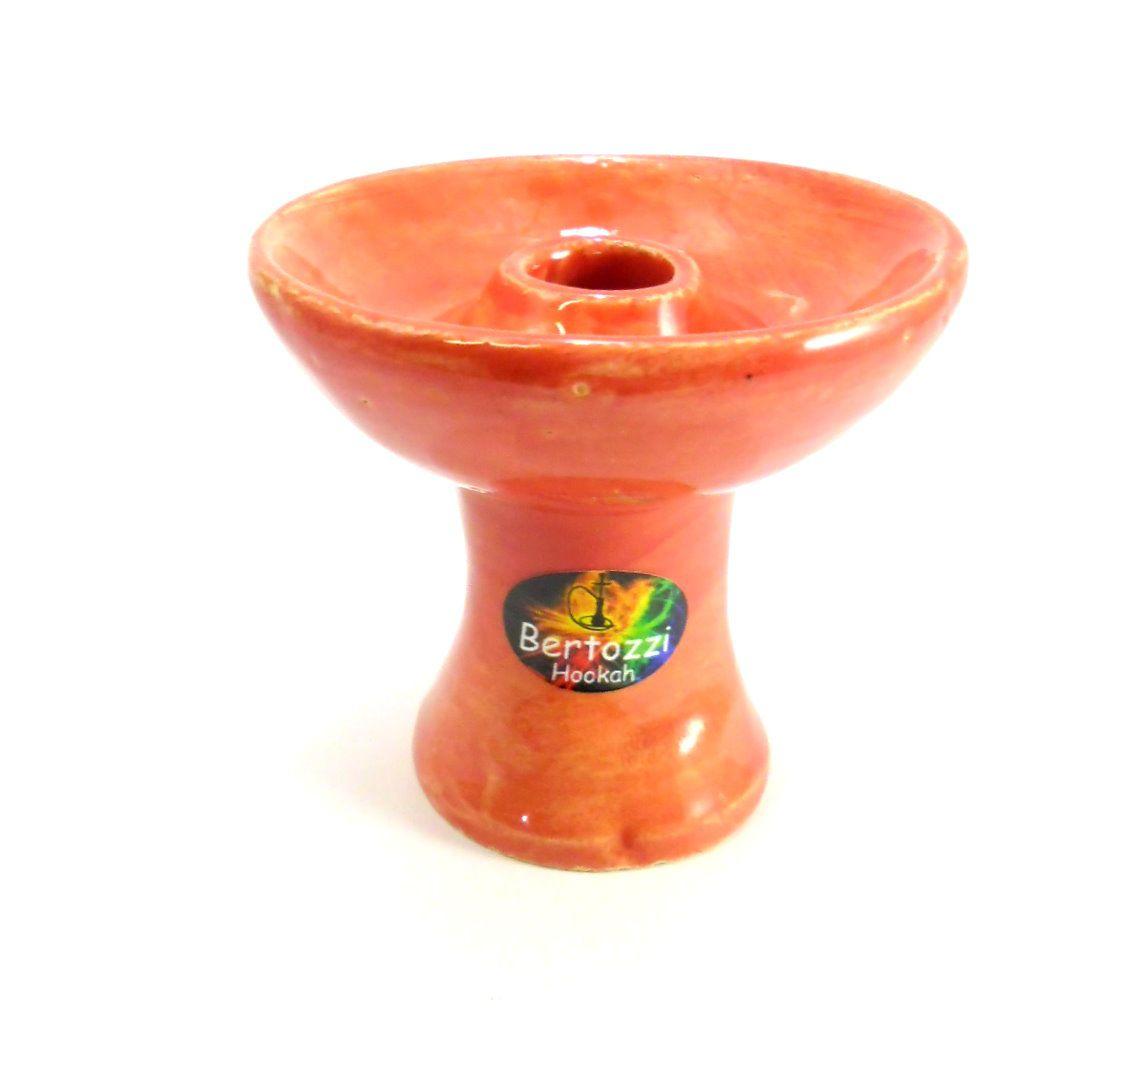 Fornilho/Rosh modelo PHUNNEL/FUNIL marca FULGORE. Em cerâmica, pintura artesanal. 7,5cm alt., 8,0cm diâmetro.